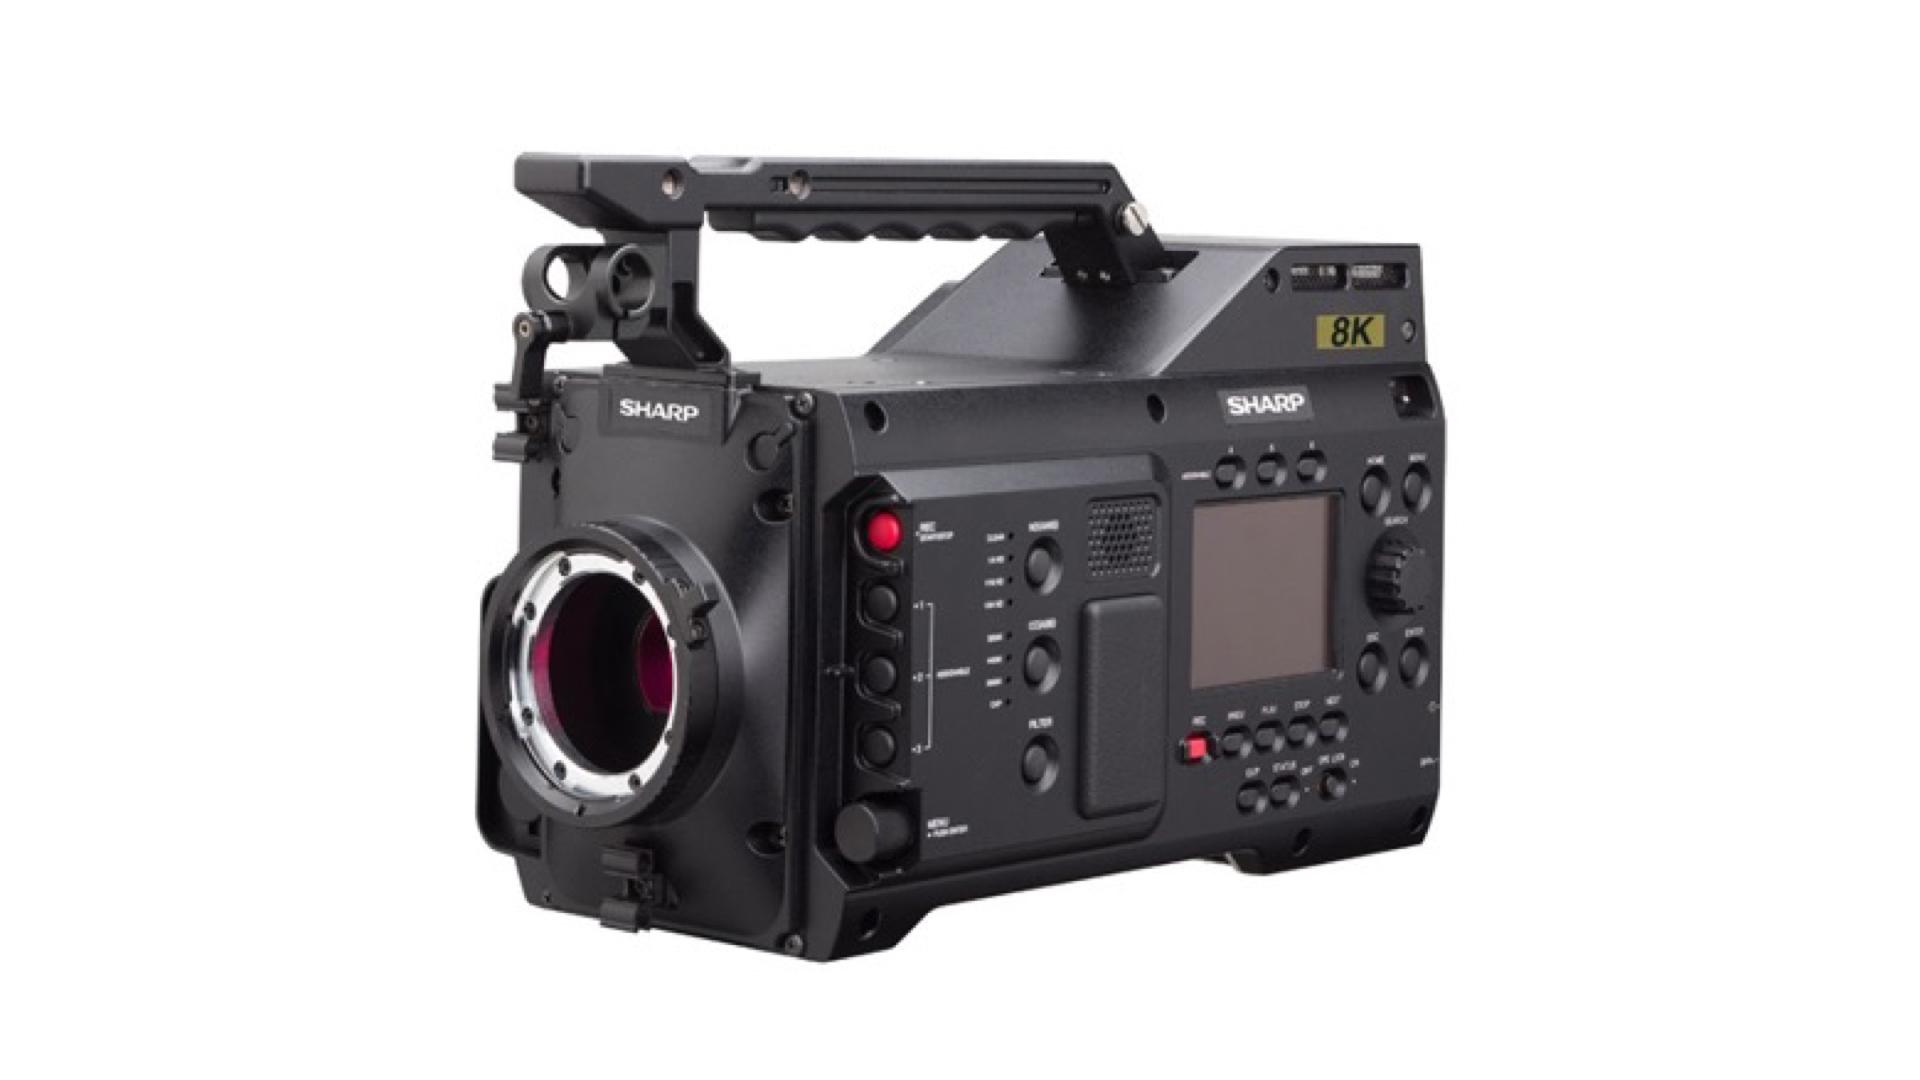 sharp 8k professional camcorder announced   cinema5d